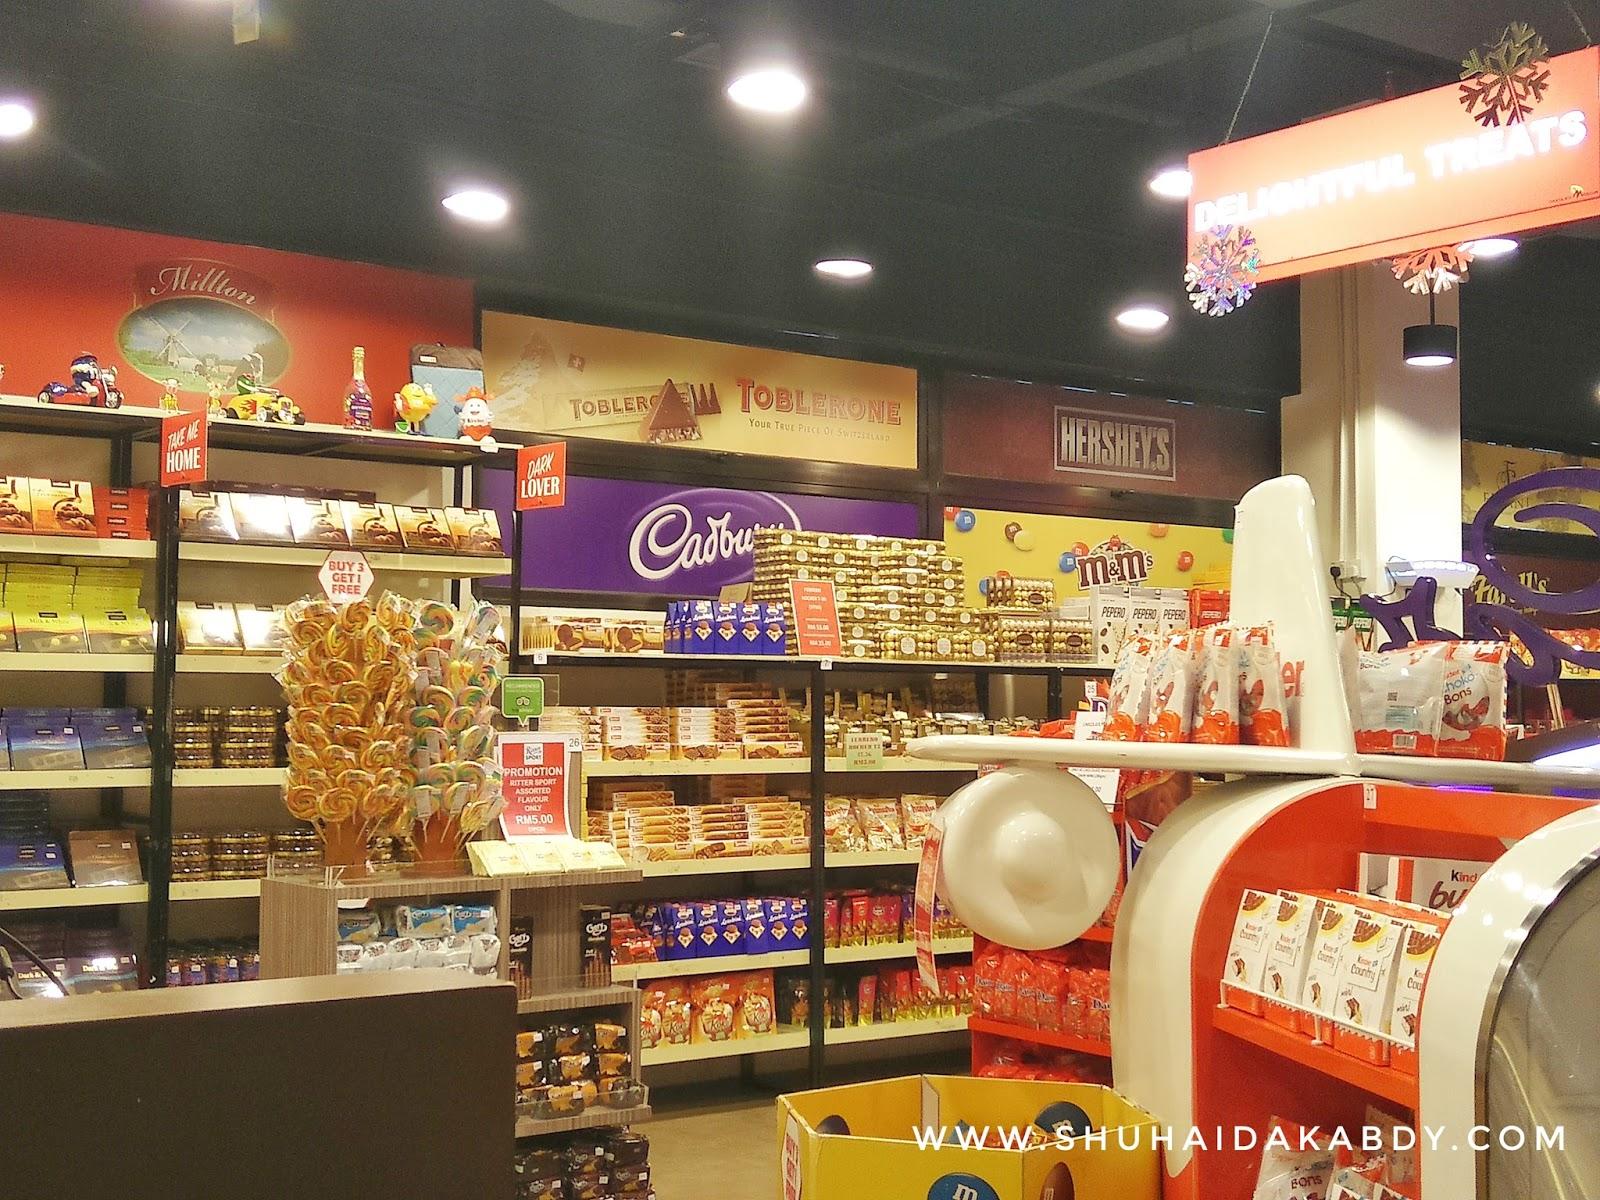 Chocolate Museum Pertama di Malaysia dan Asia